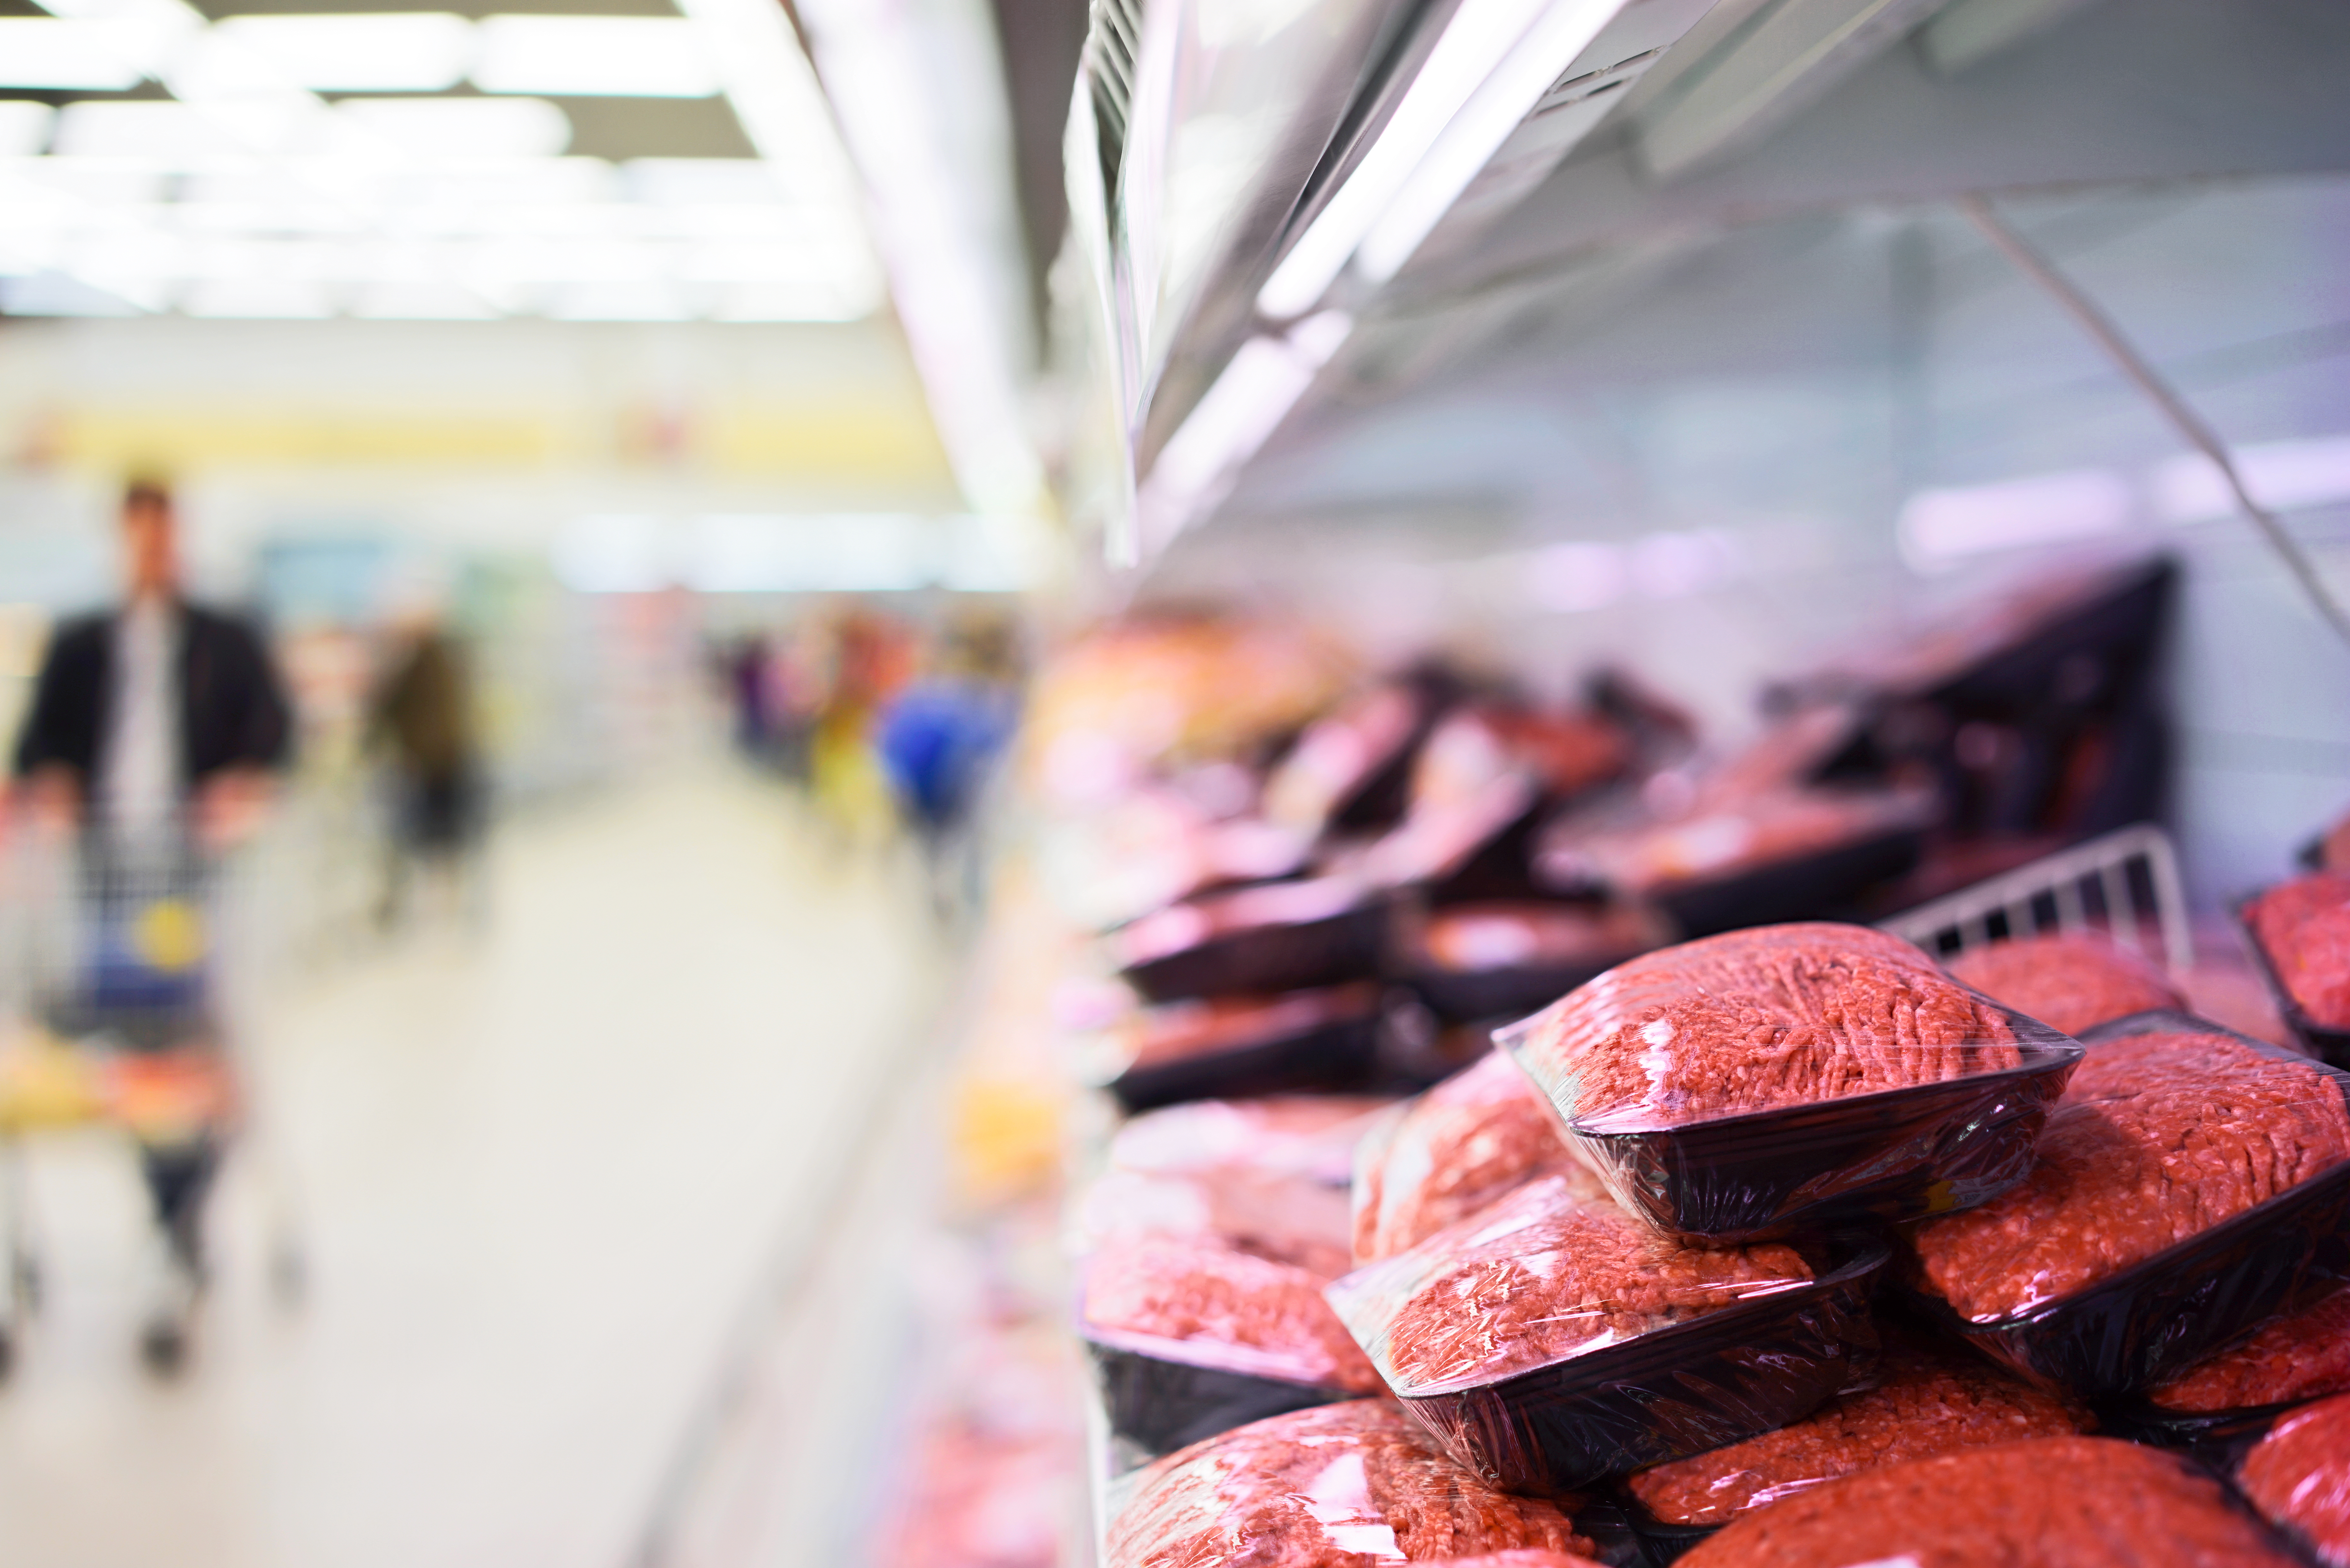 Salmonella i kottfars pa svenska restauranger